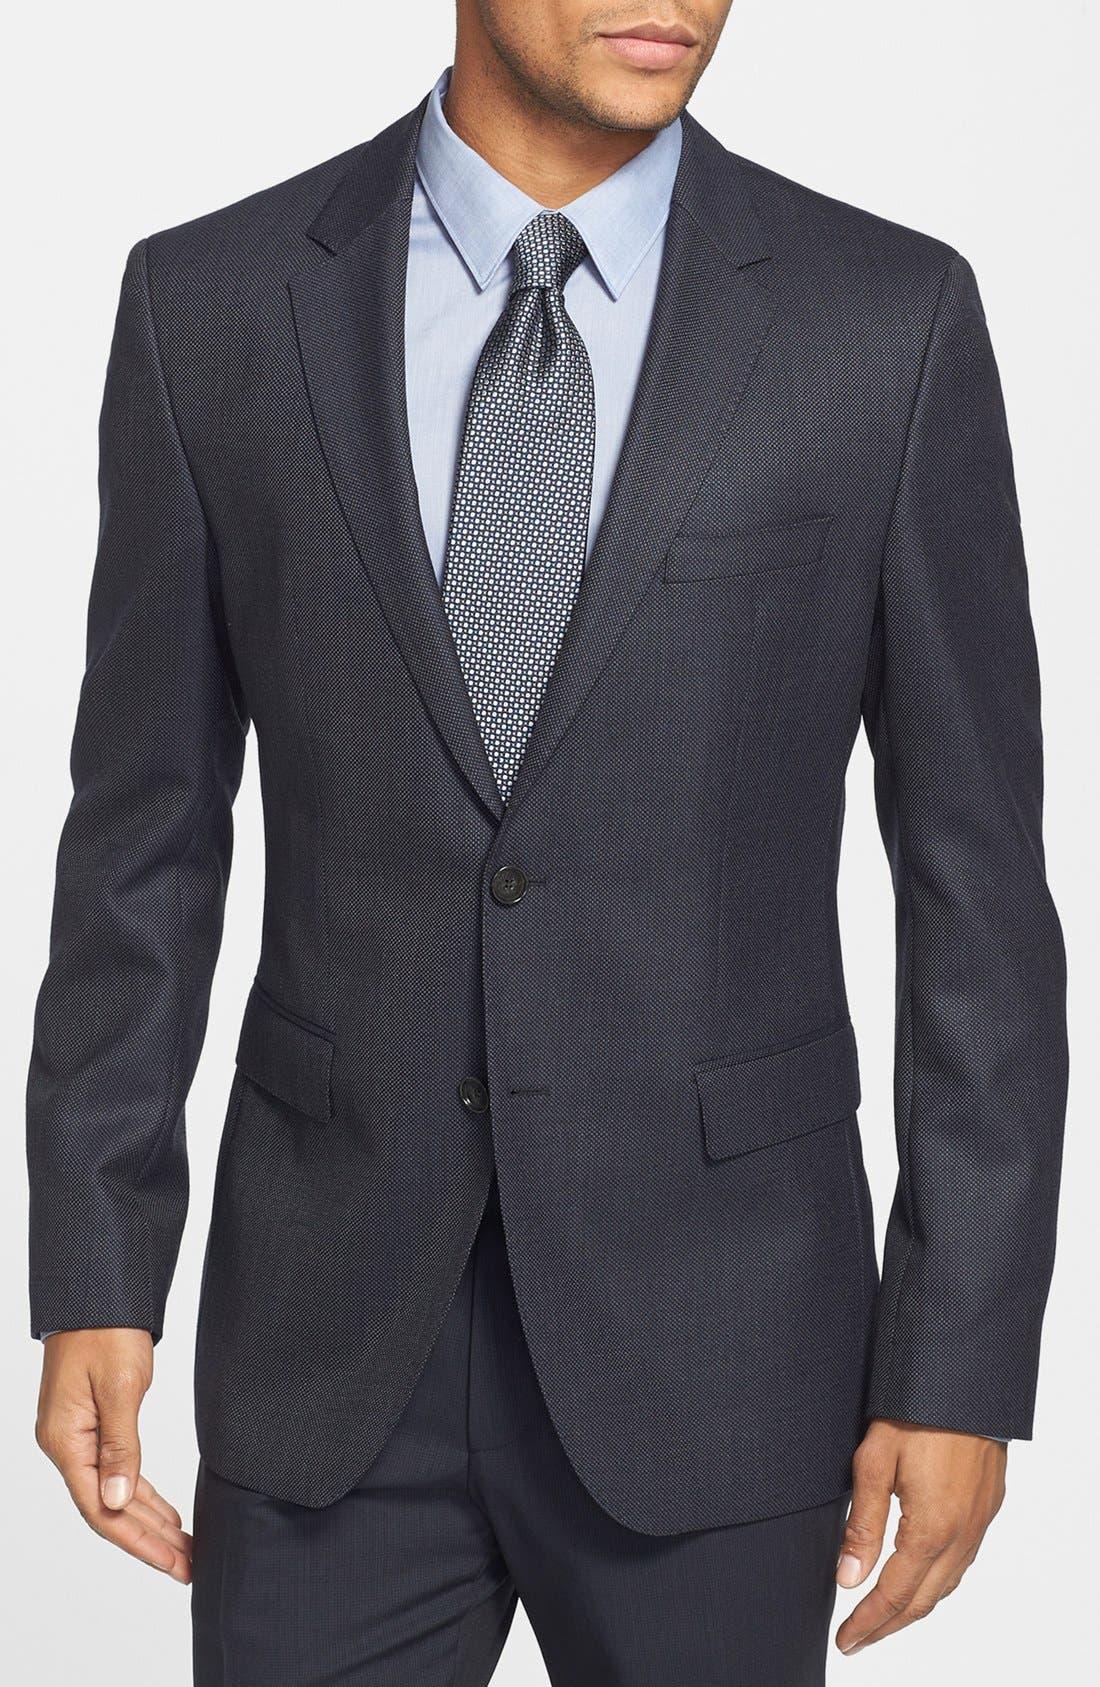 Main Image - BOSS HUGO BOSS 'James' Trim Fit Wool Sportcoat